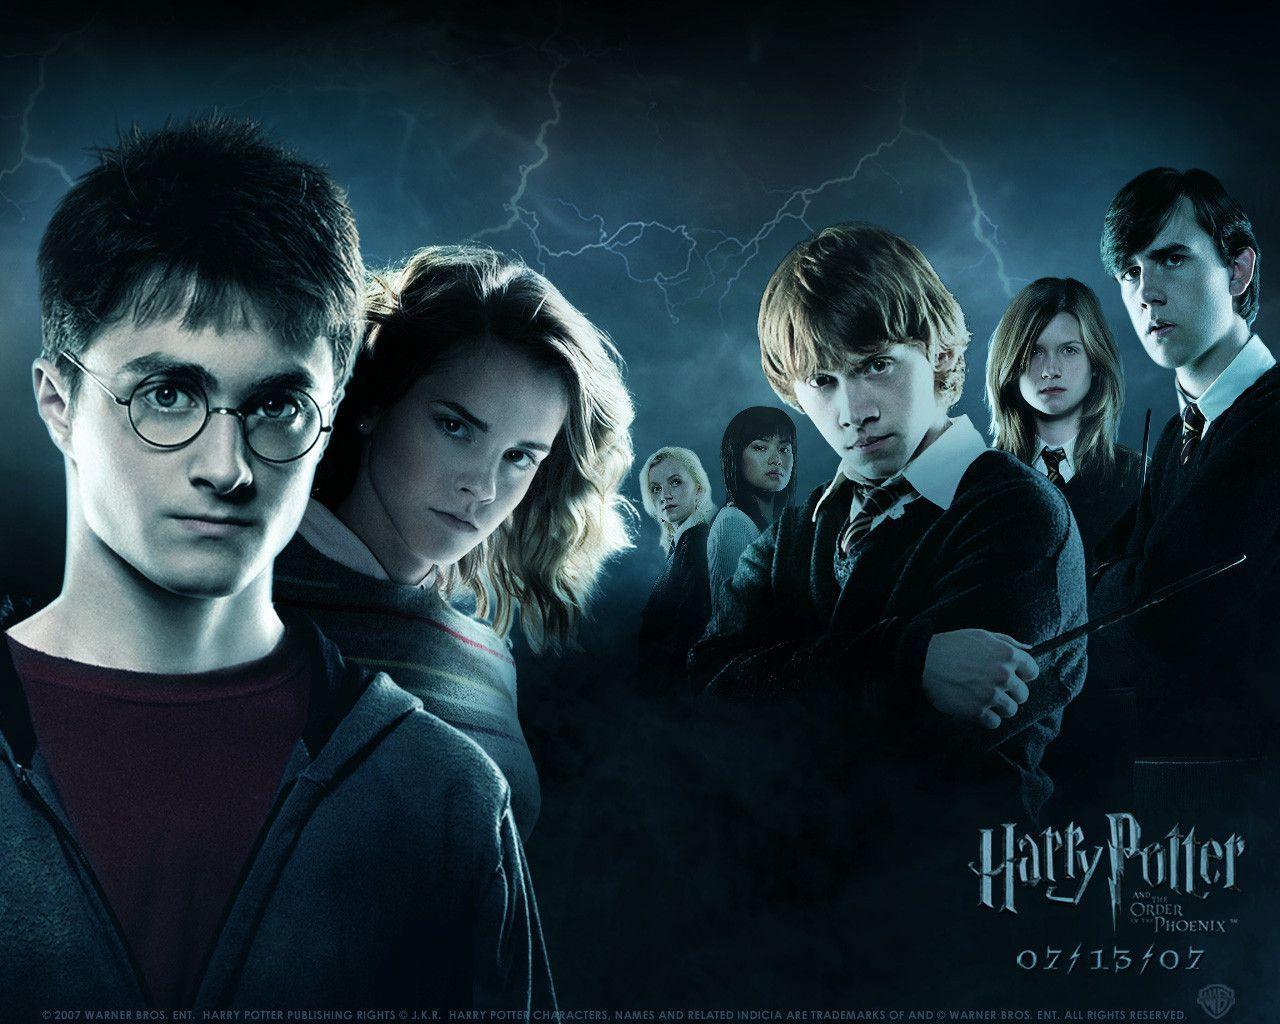 Best Wallpaper Harry Potter Twitter - Q8BqzEI  You Should Have_631491.jpg